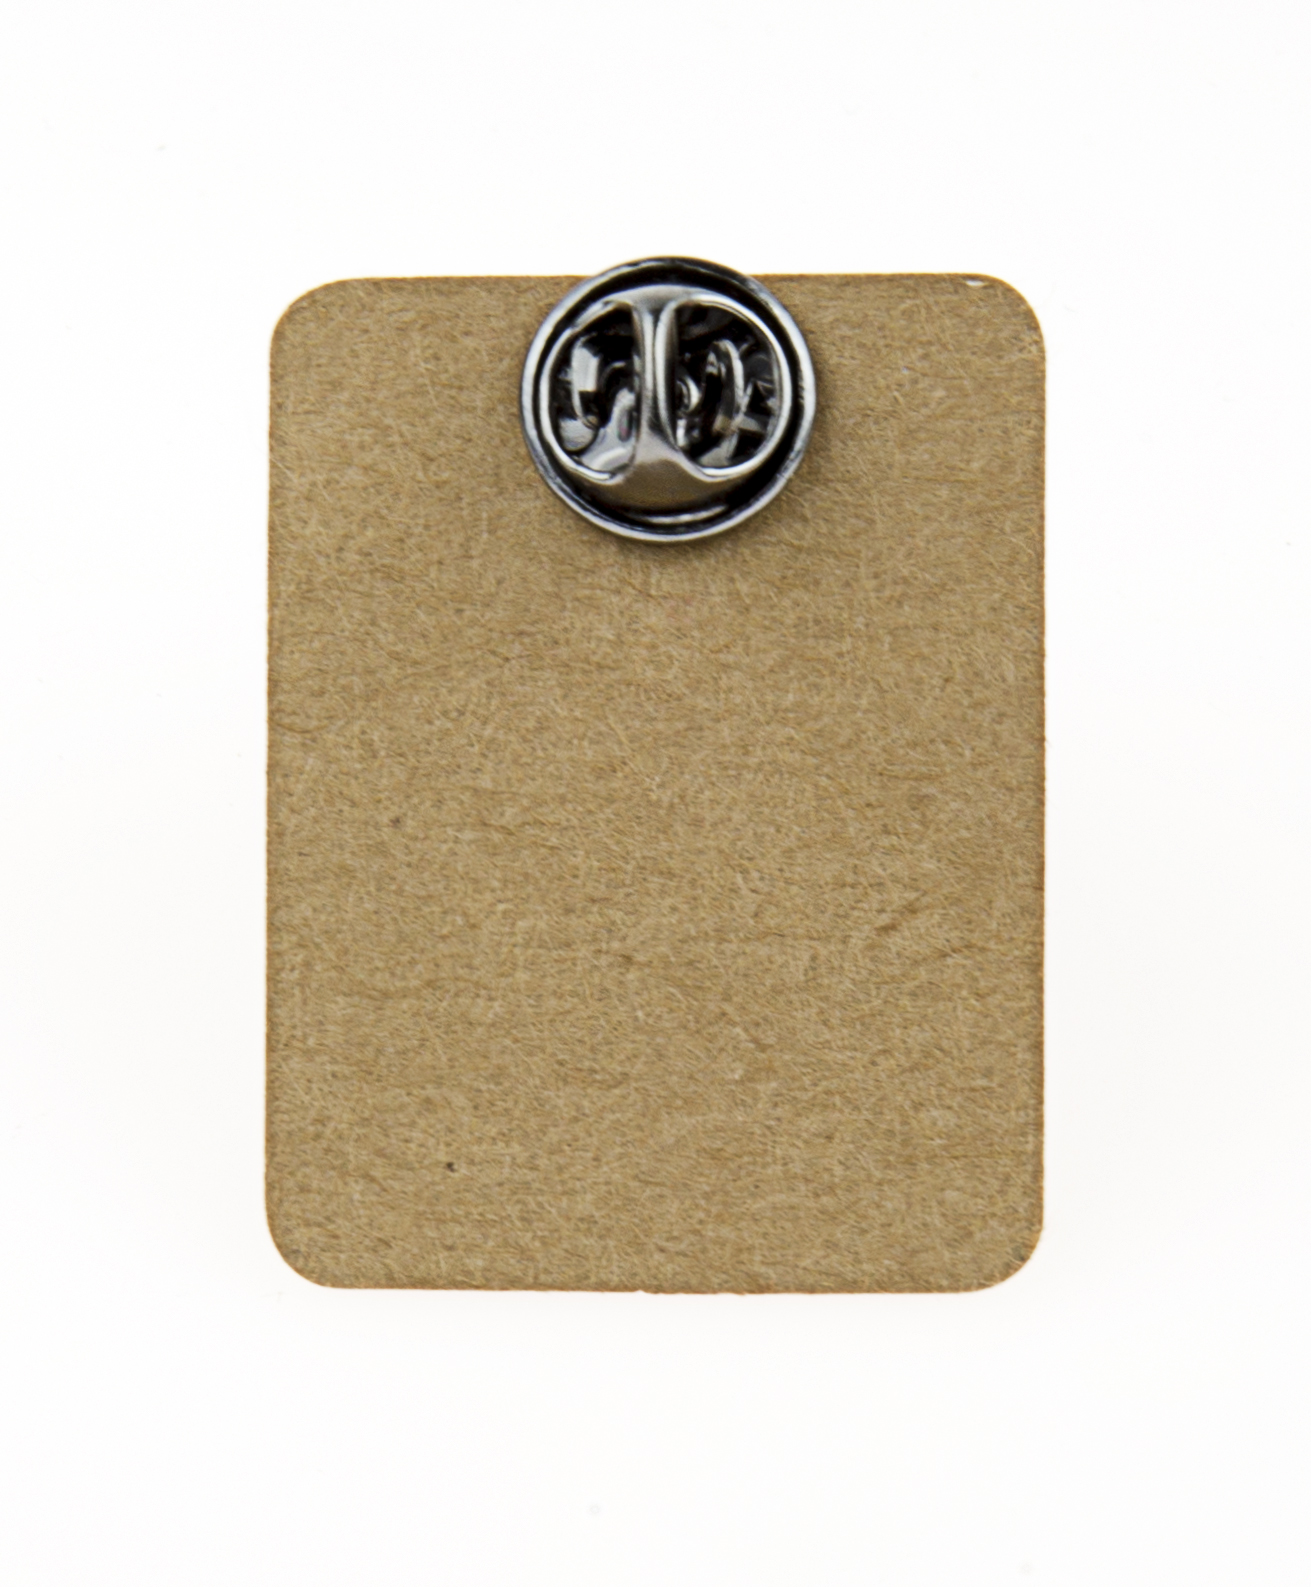 Metal Clef Sign Music Enamel Pin Badge